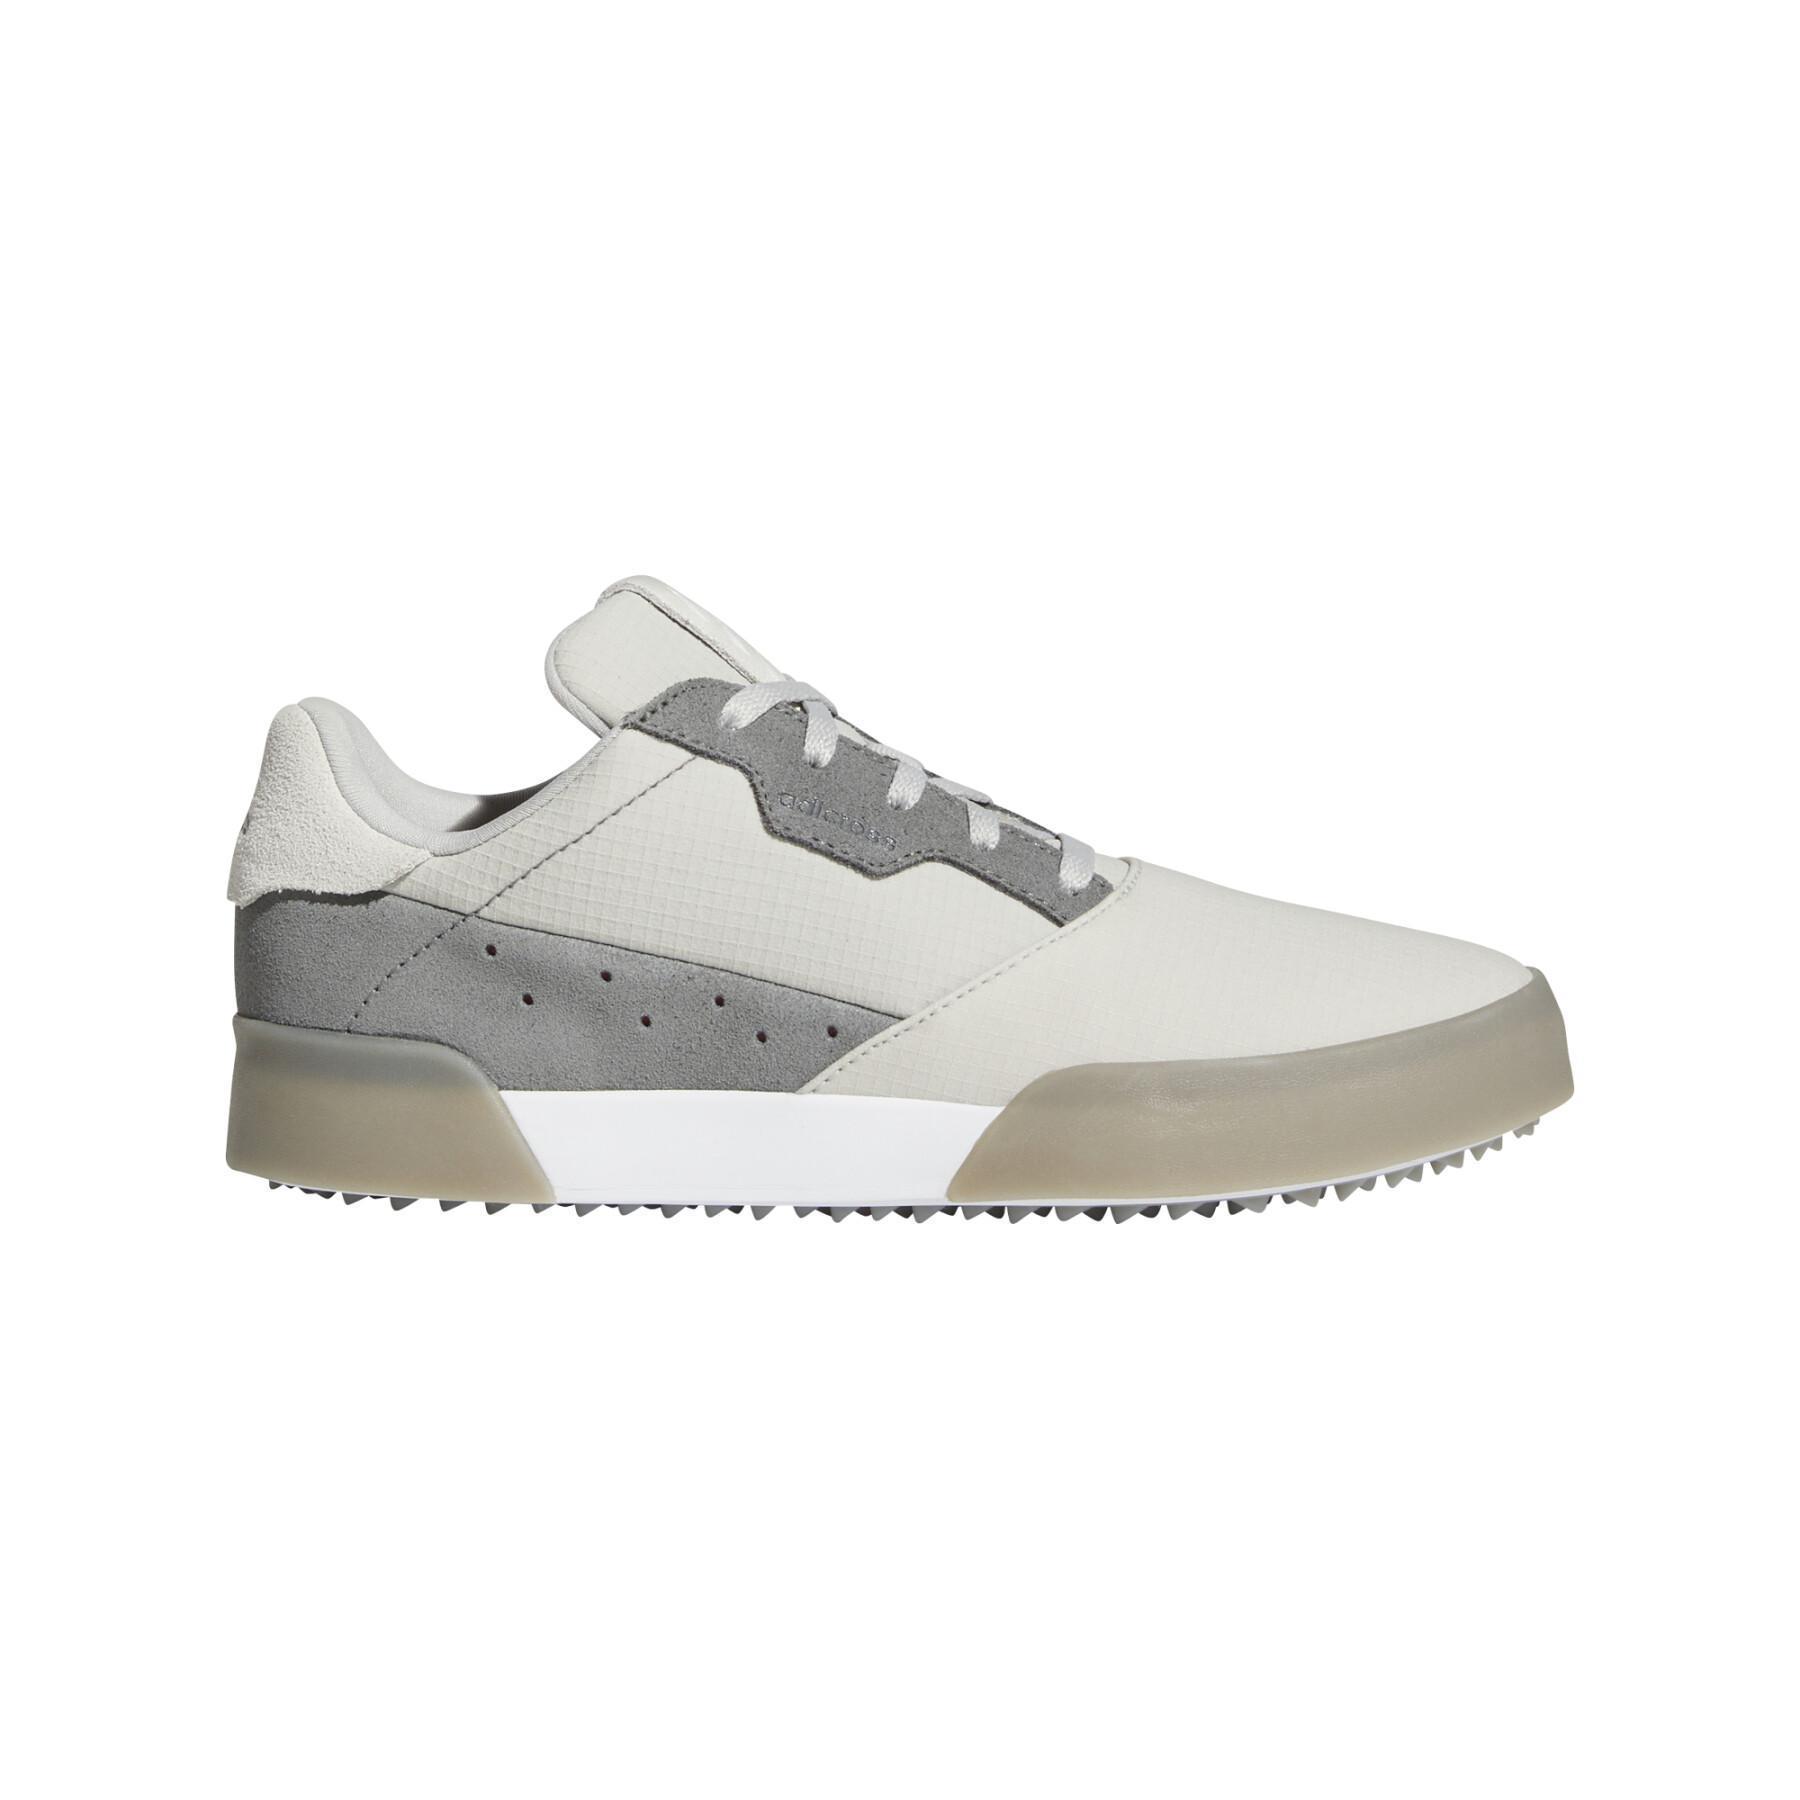 Chaussures enfant adidas Adicross Retro